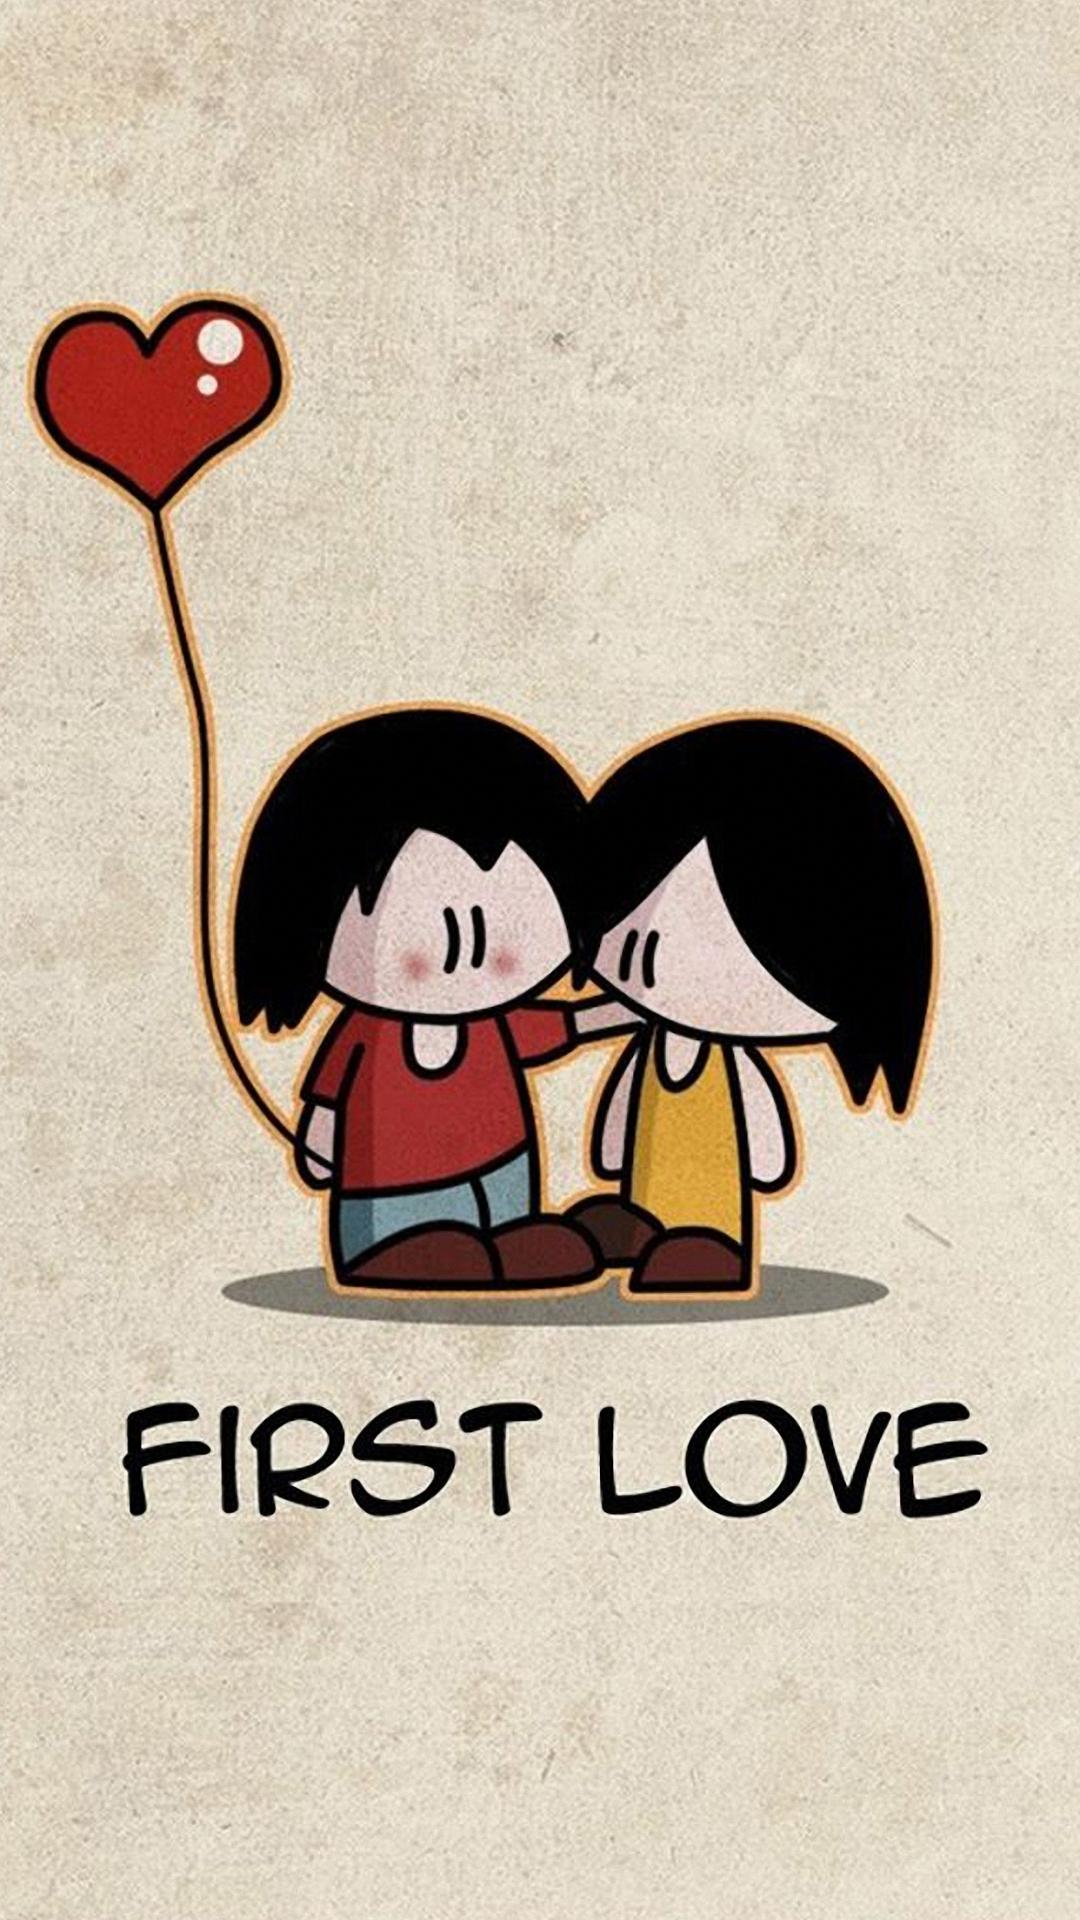 Cartoon Love Iphone 6 Wallpapers Hd - Love Lock Screen Hd , HD Wallpaper & Backgrounds